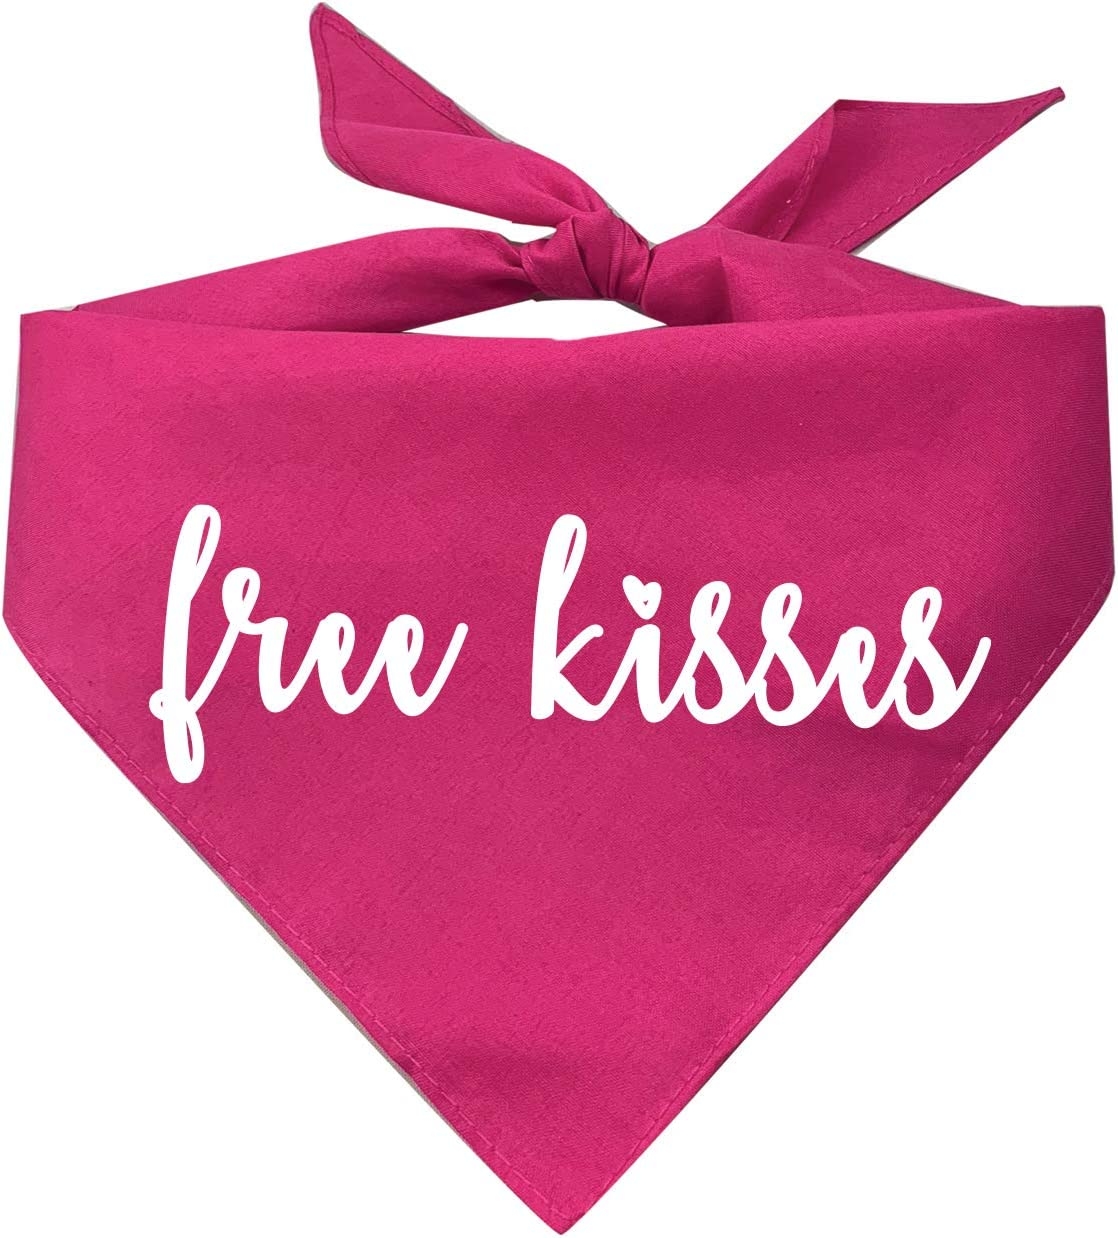 Free Kisses Dog Bandana Assorted Colors